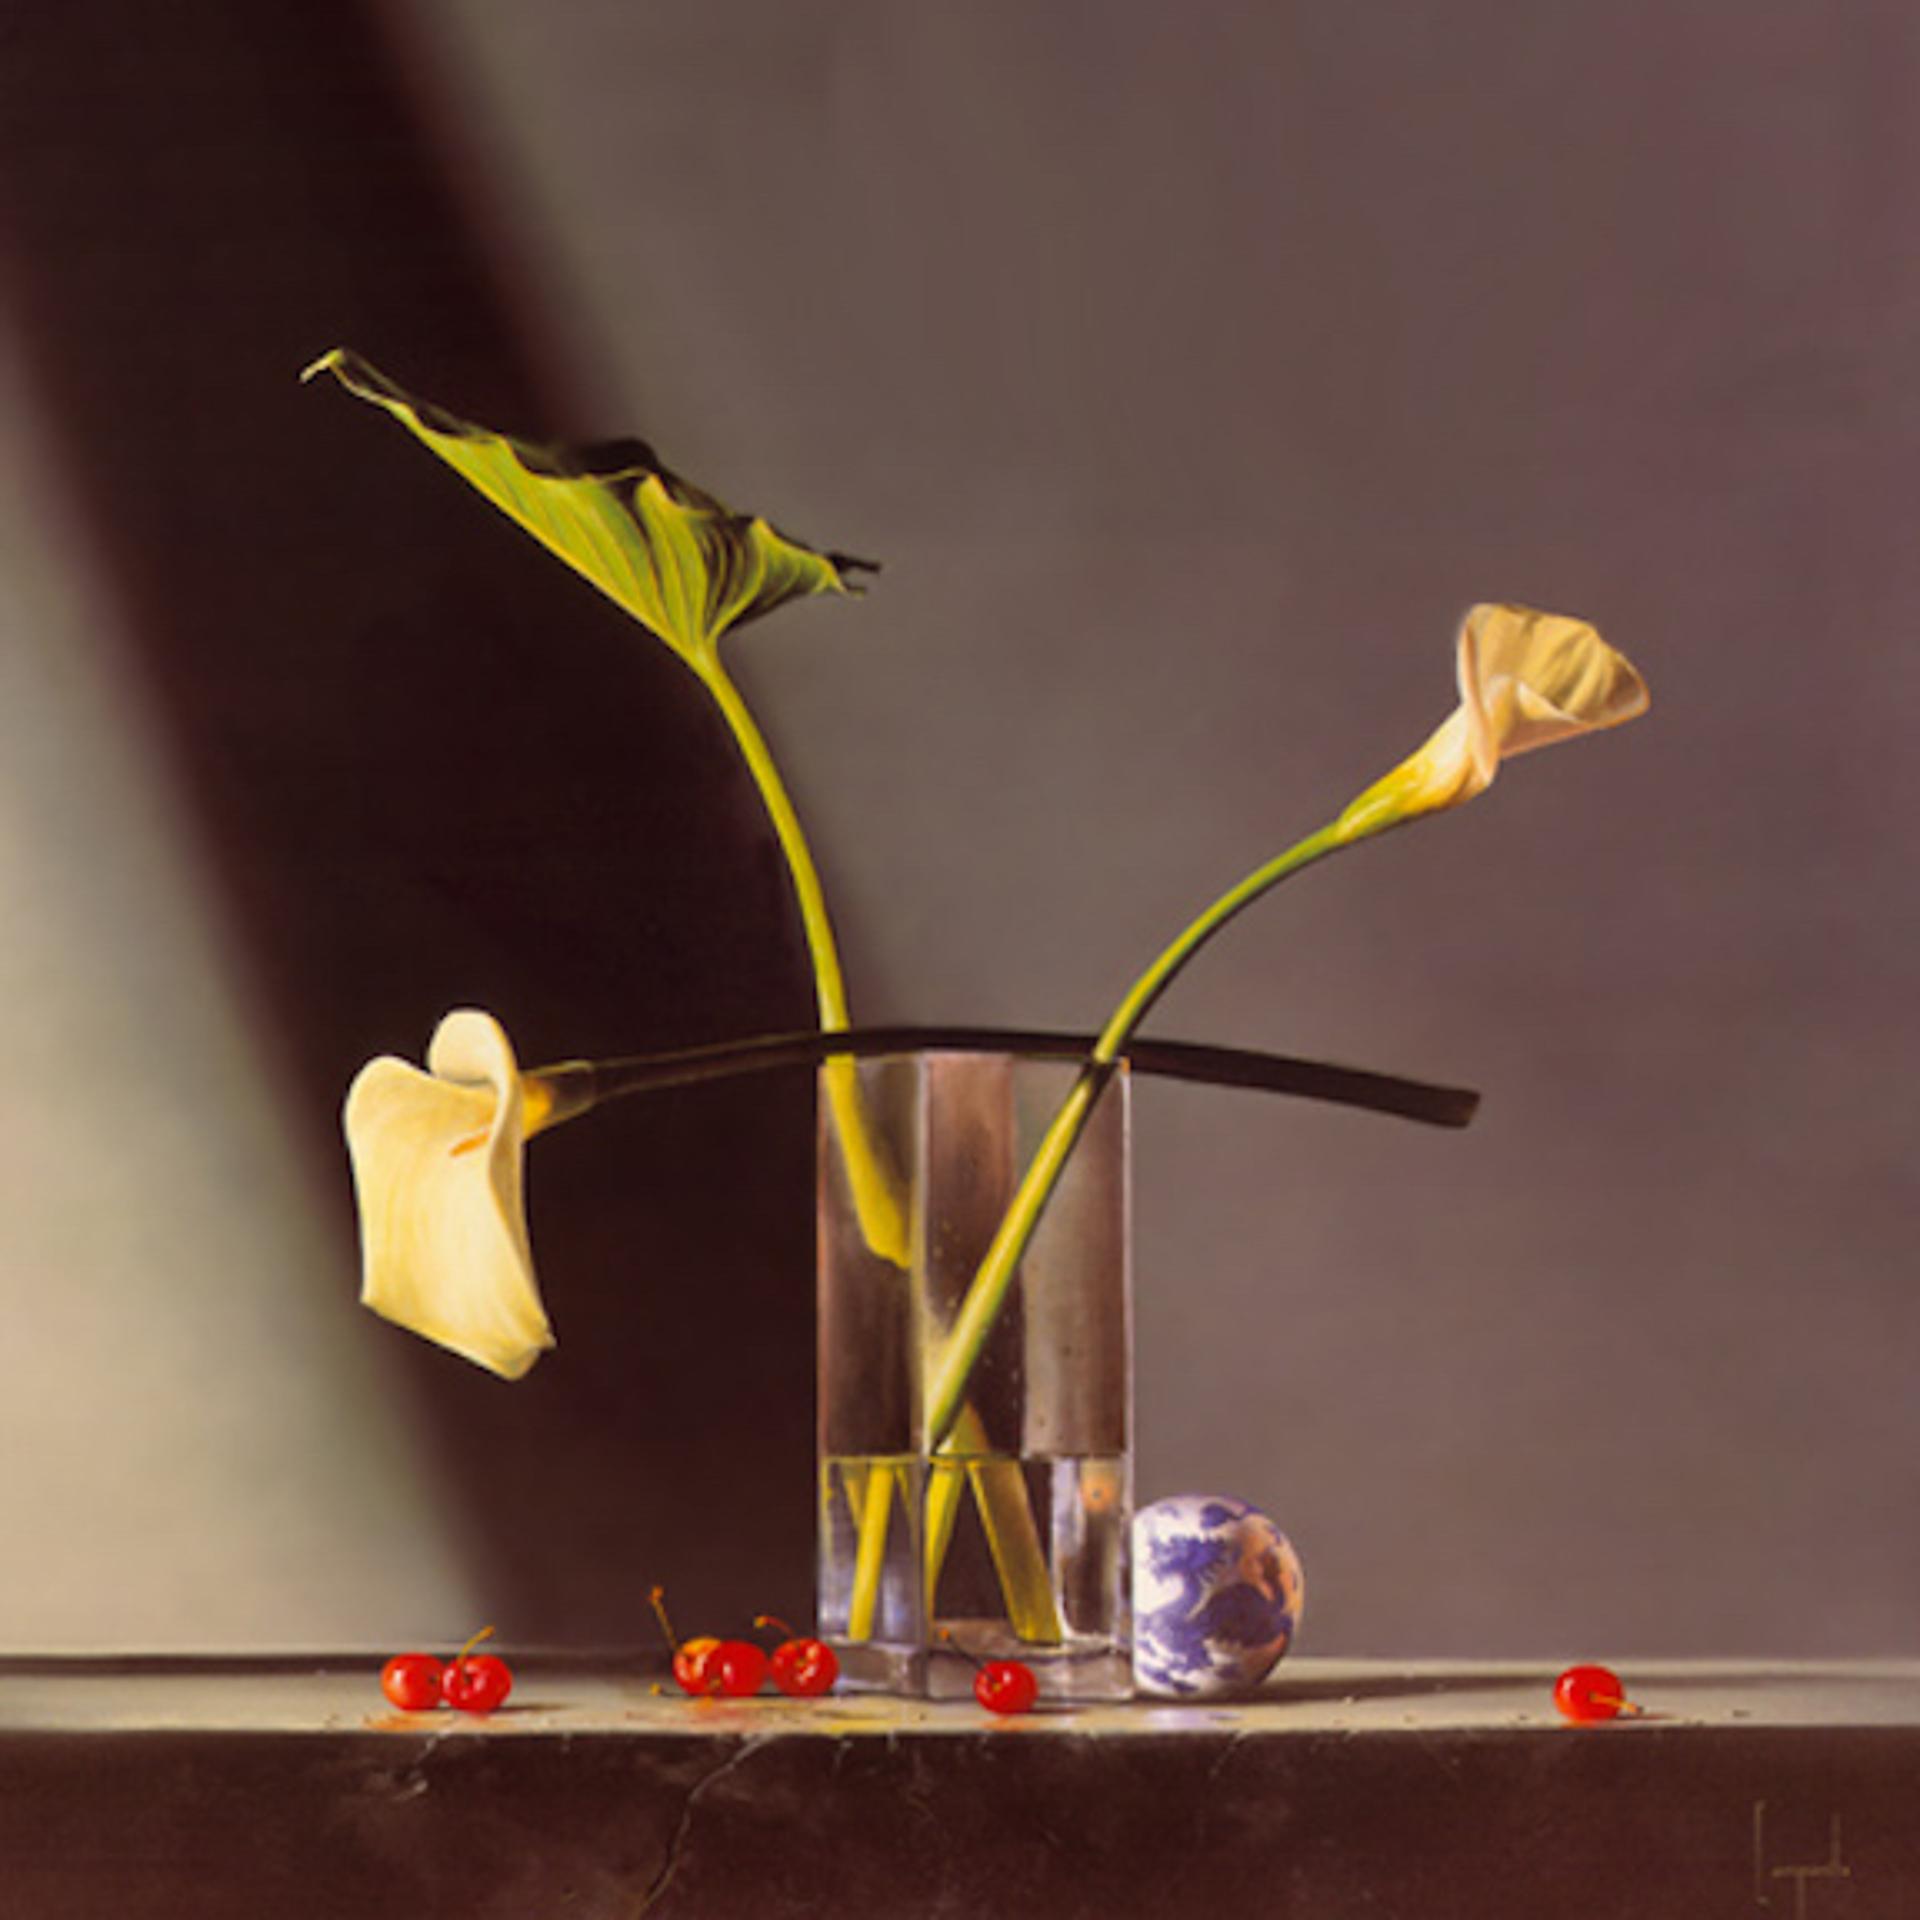 Dragon Lily by Dario Campanile